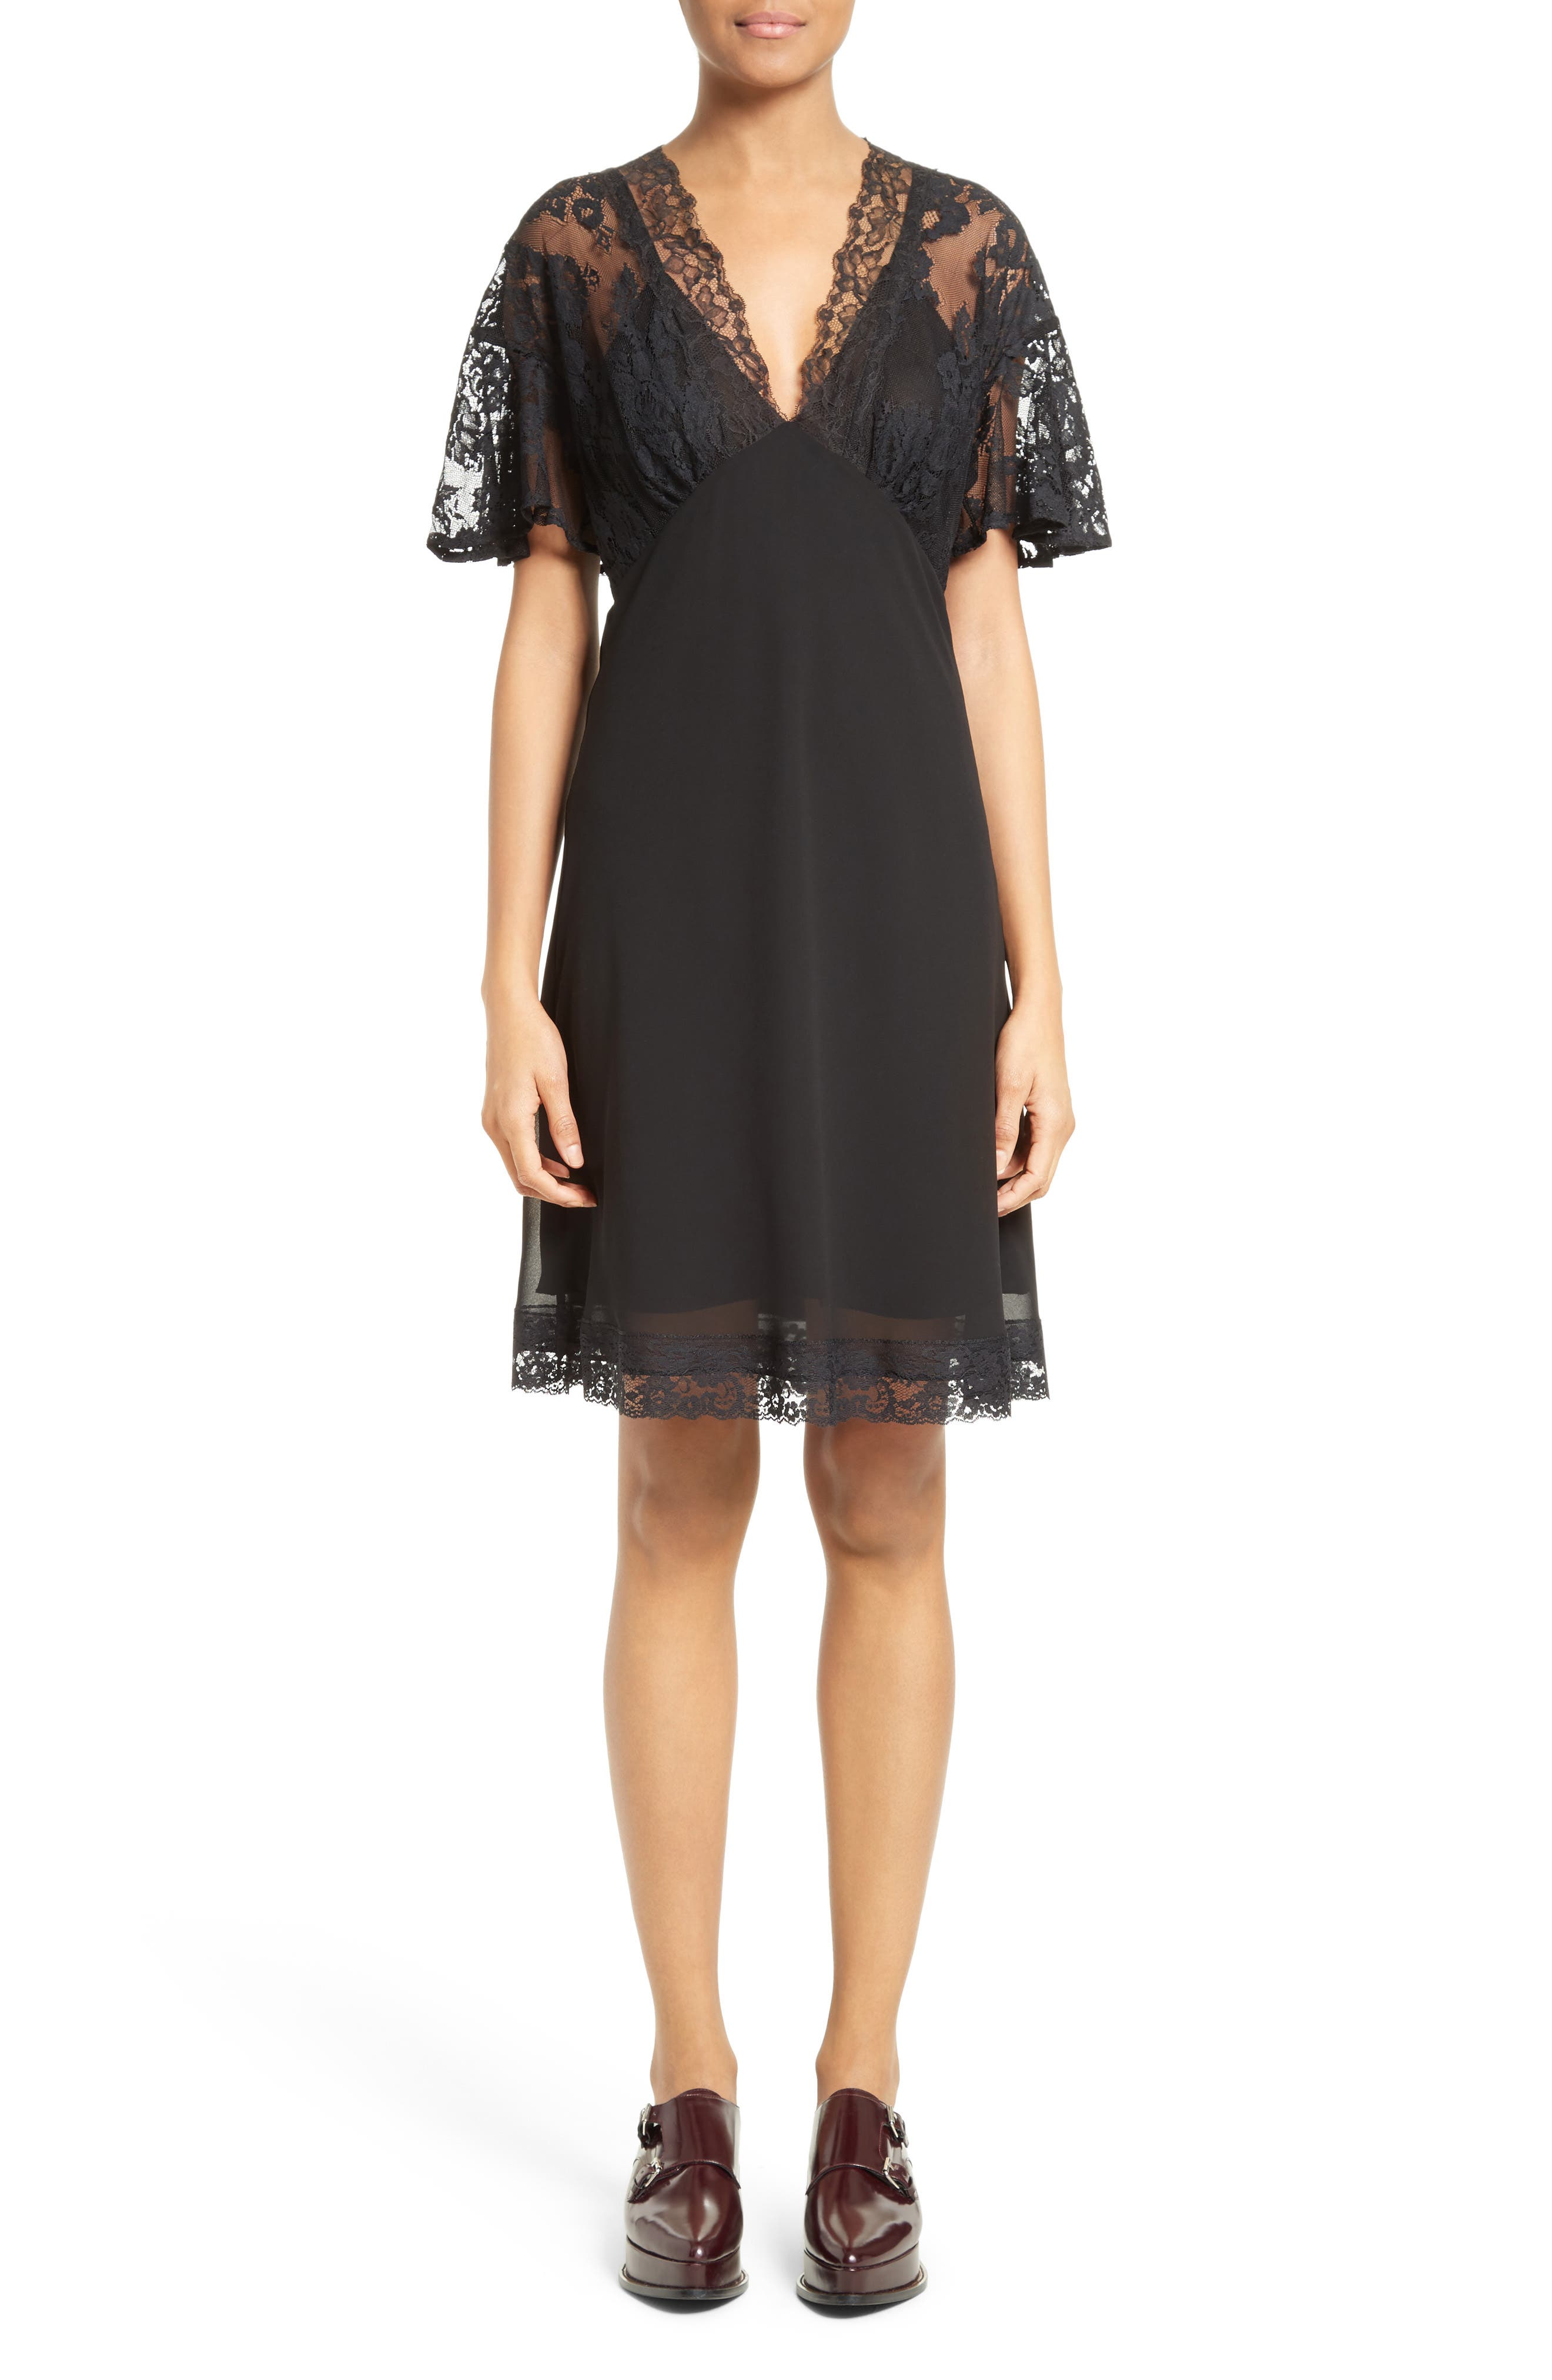 Main Image - McQ Alexander McQueen Volant Lace Dress